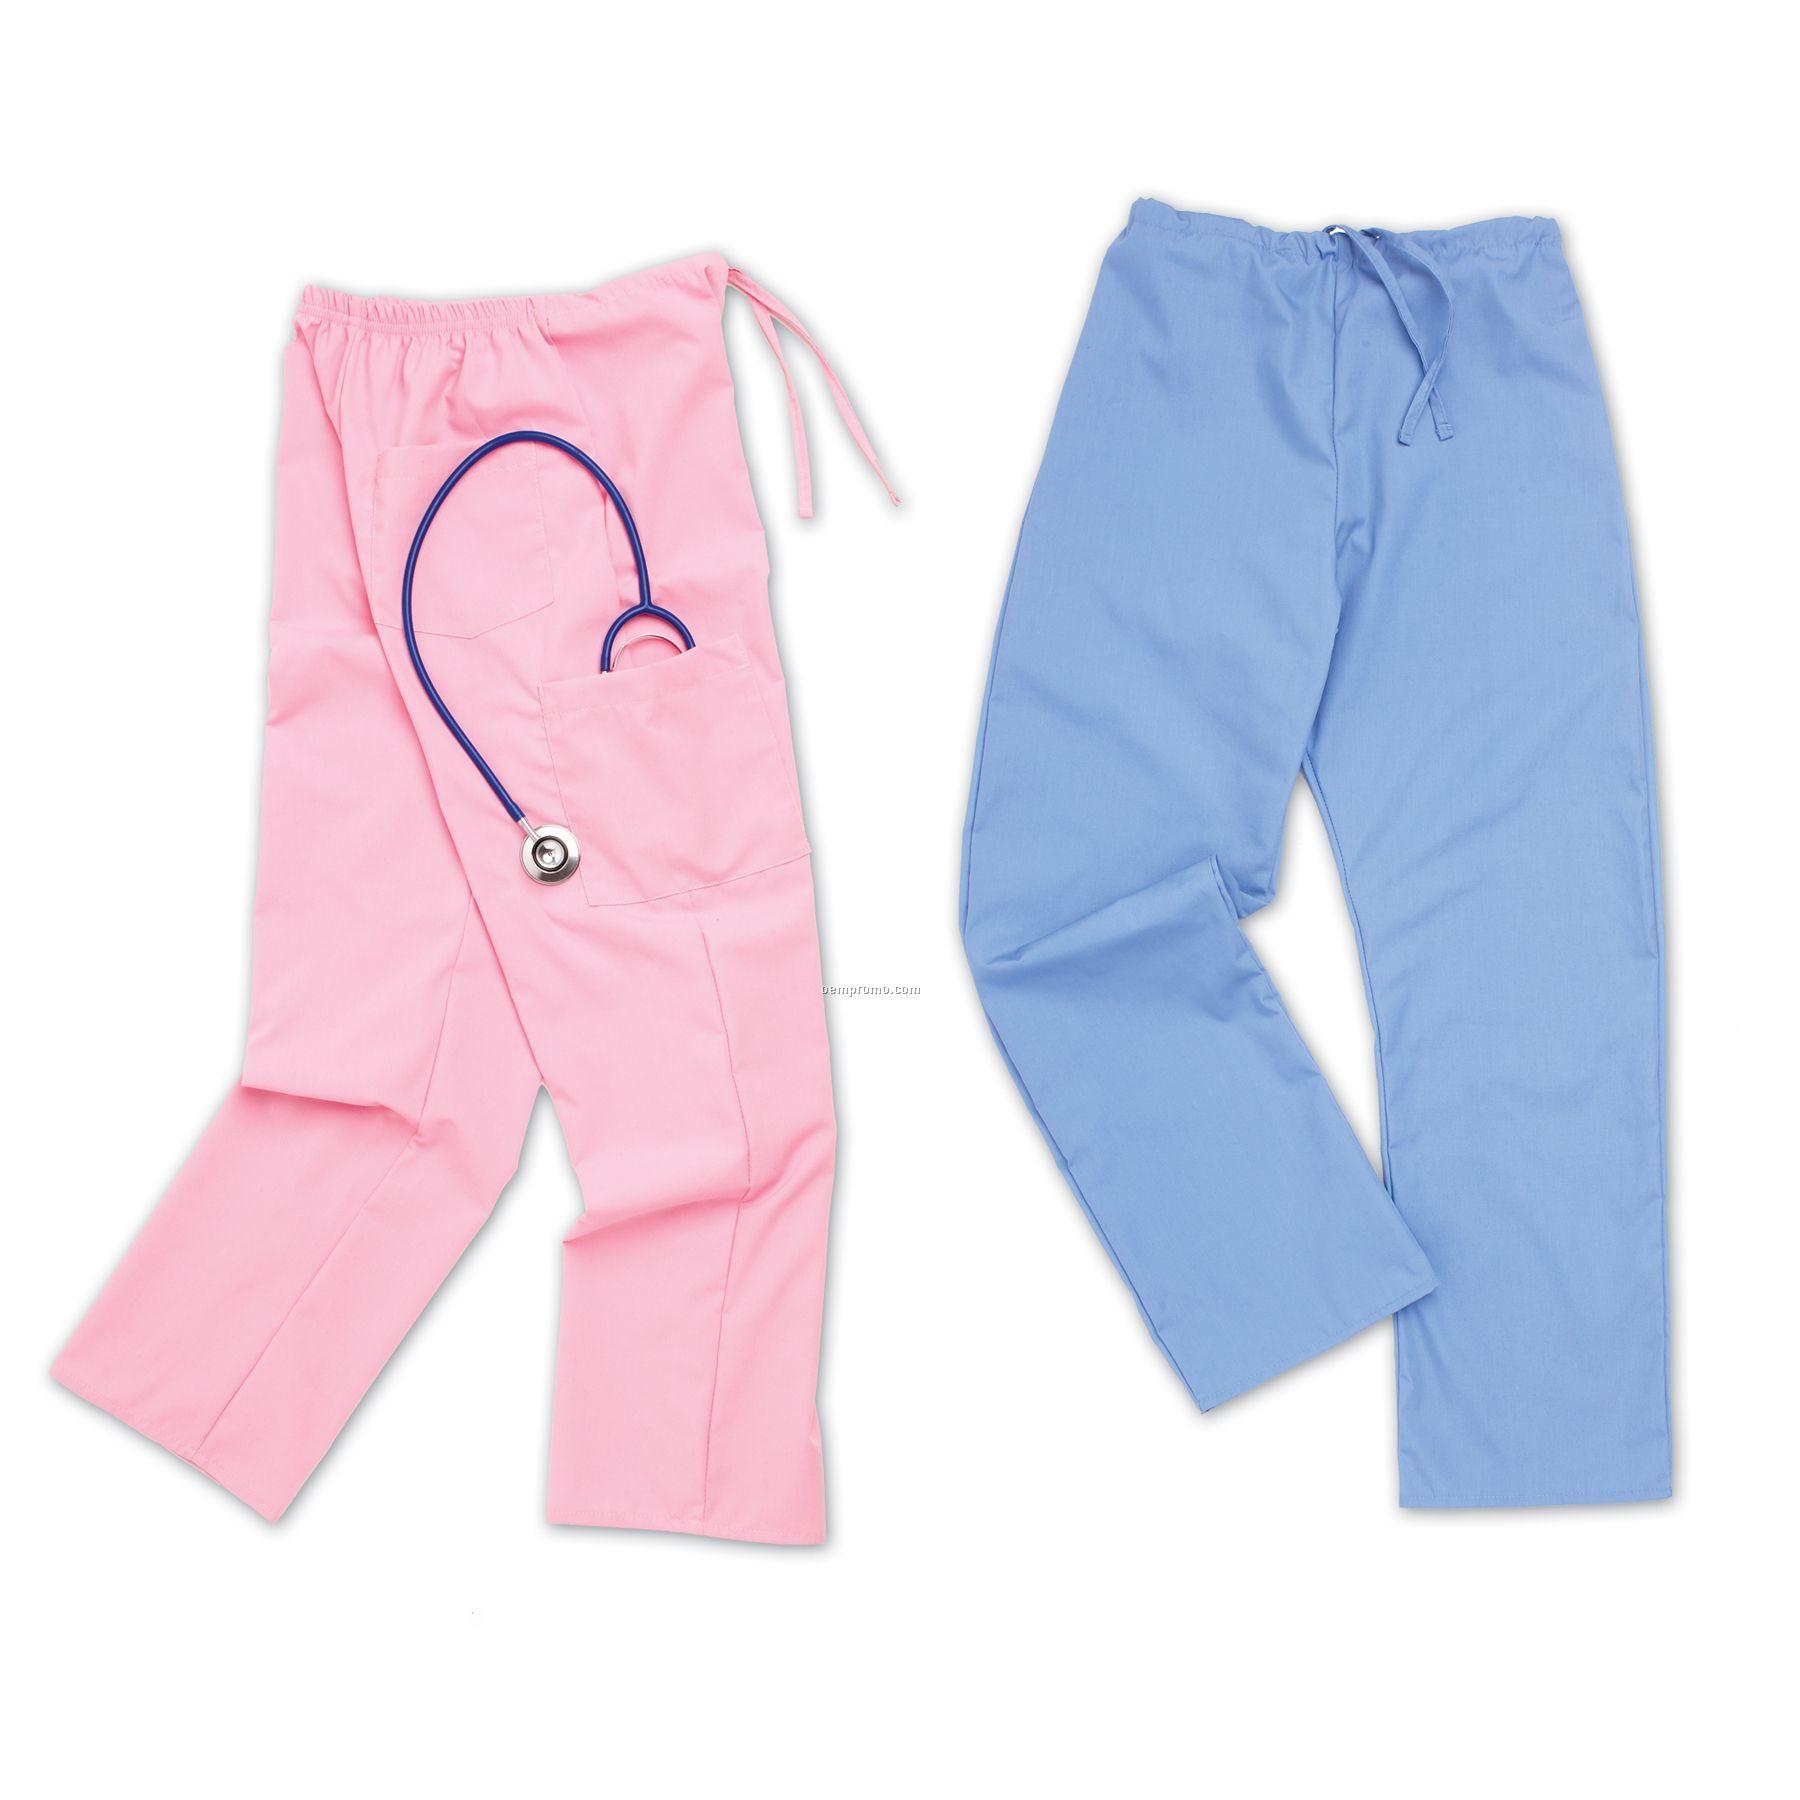 Solid Color Scrub Wear Drawstring Pants (S-xl)